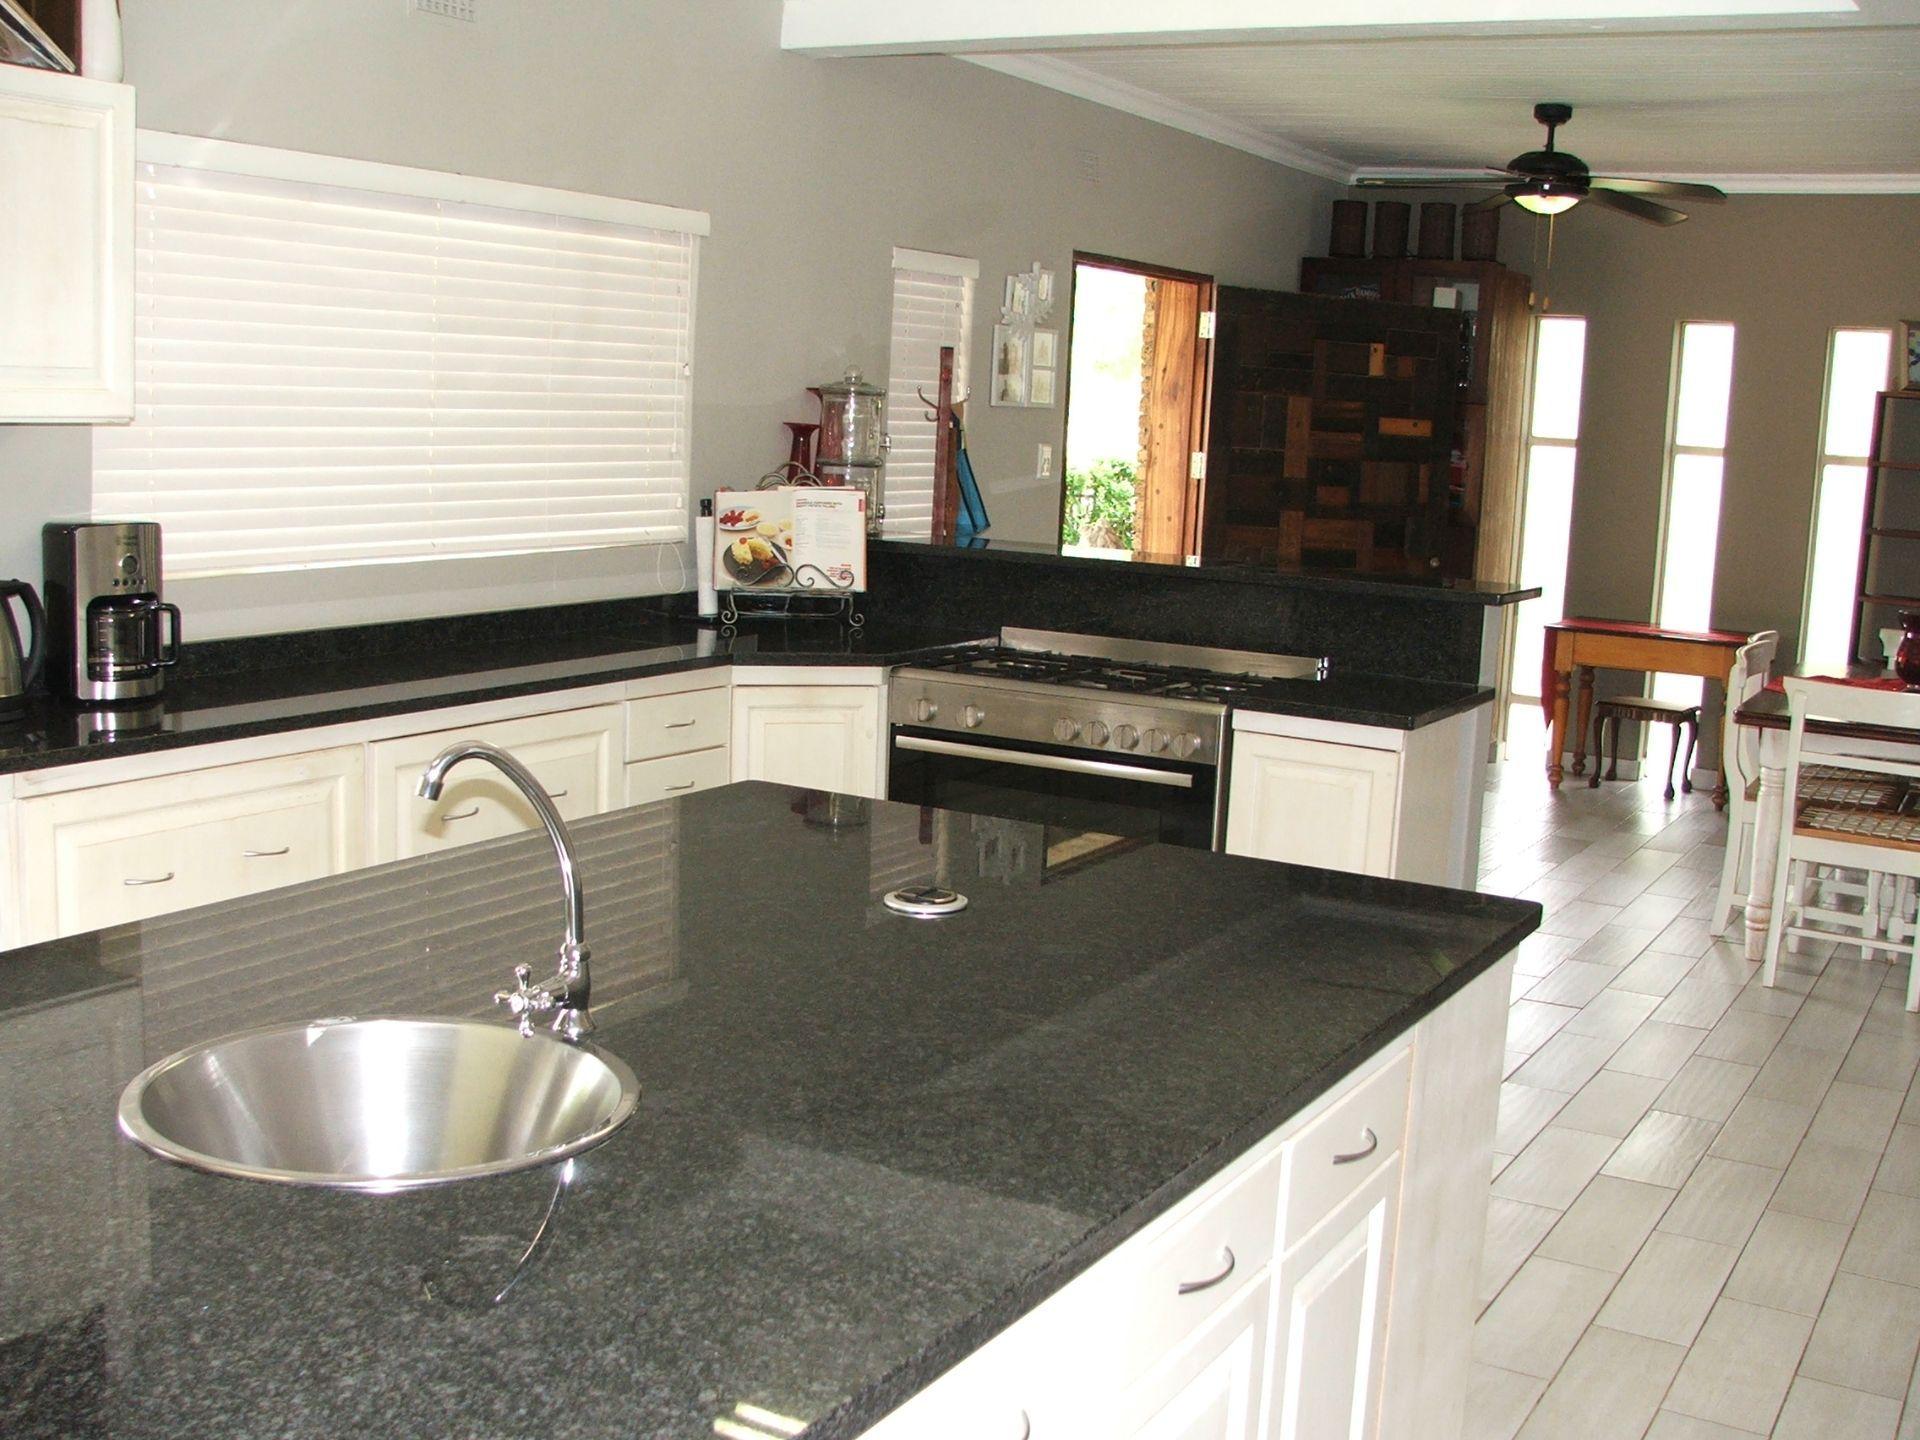 Hoedspruit property for sale. Ref No: 13576108. Picture no 8